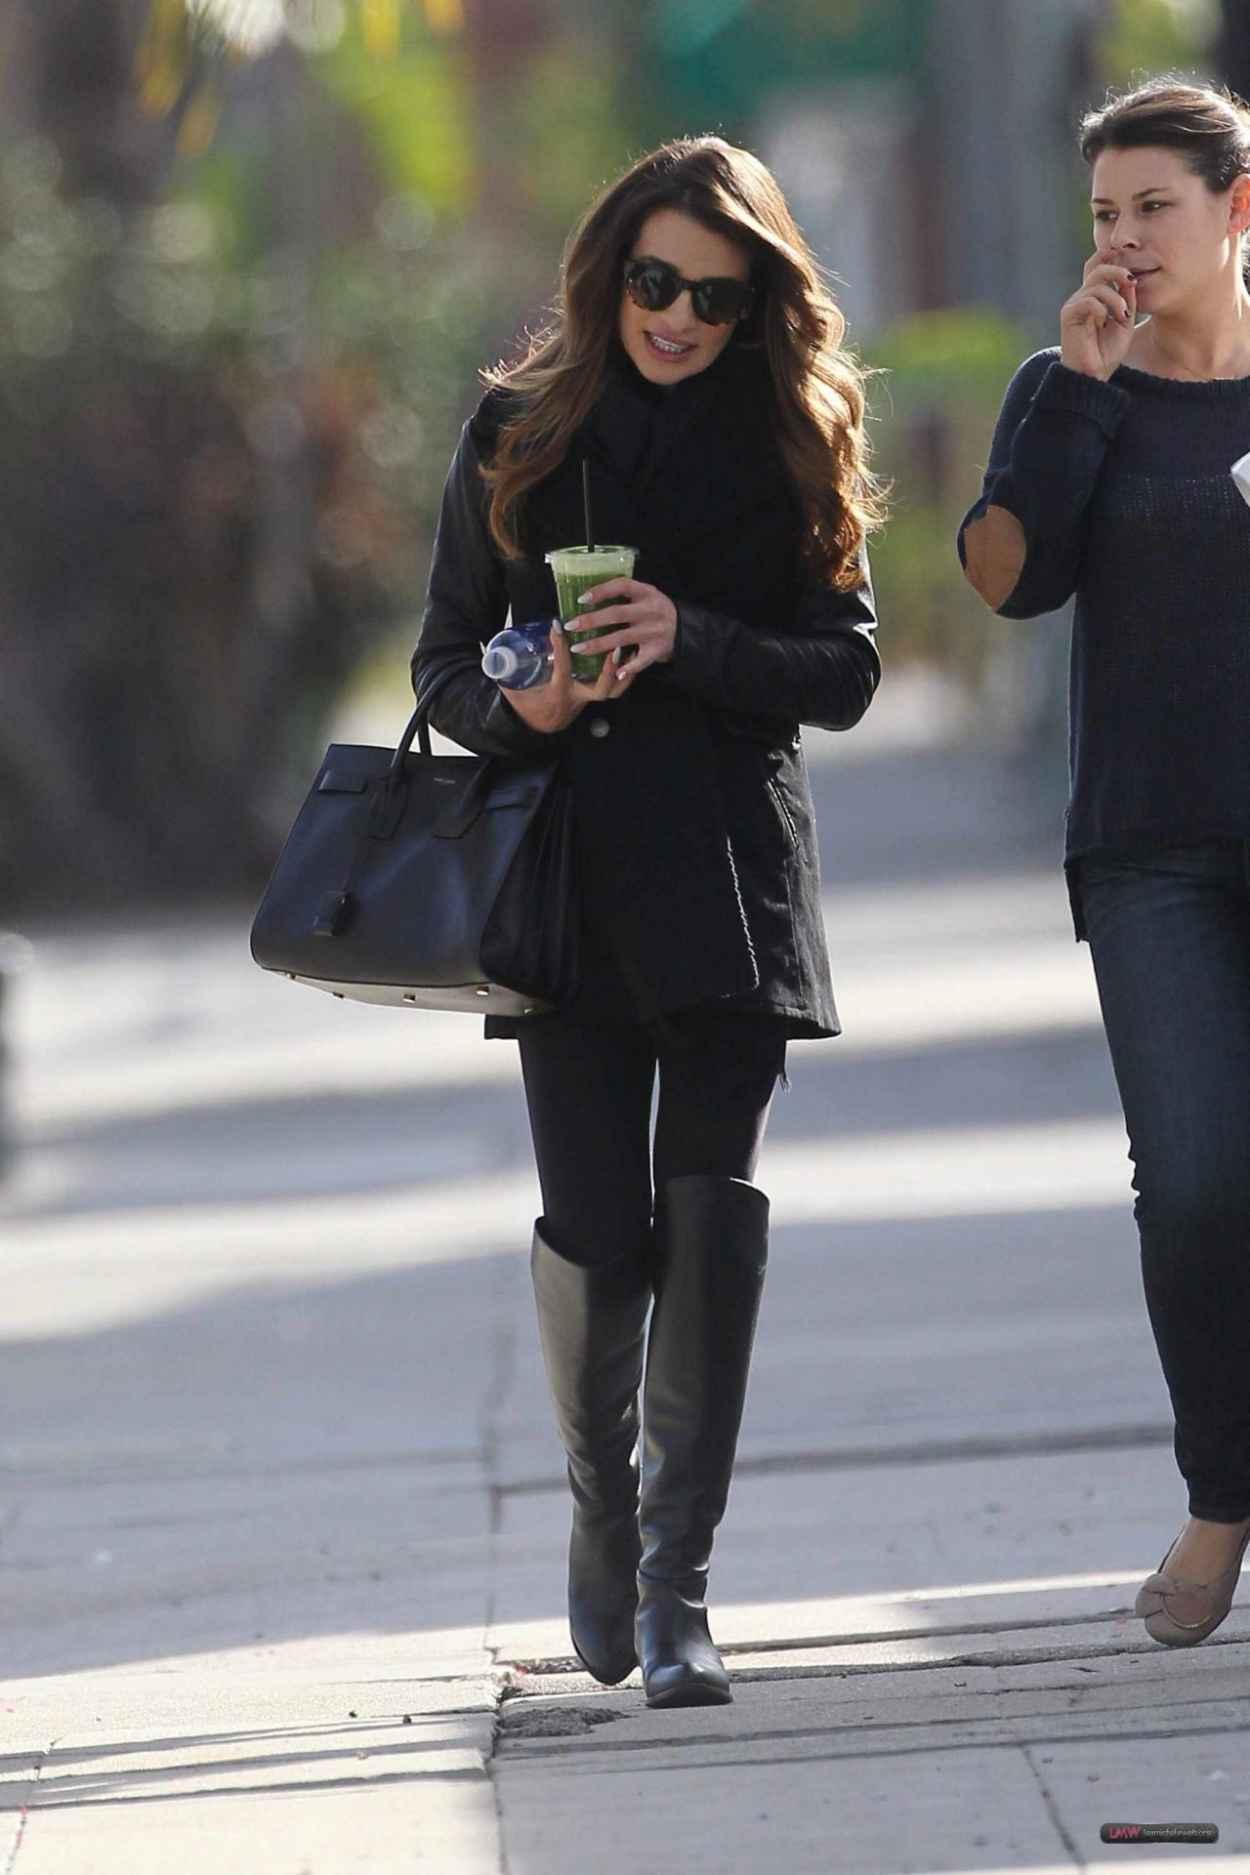 Lea Michele Street Style - Leaving Studio in W. Hollywood - December 2015-2